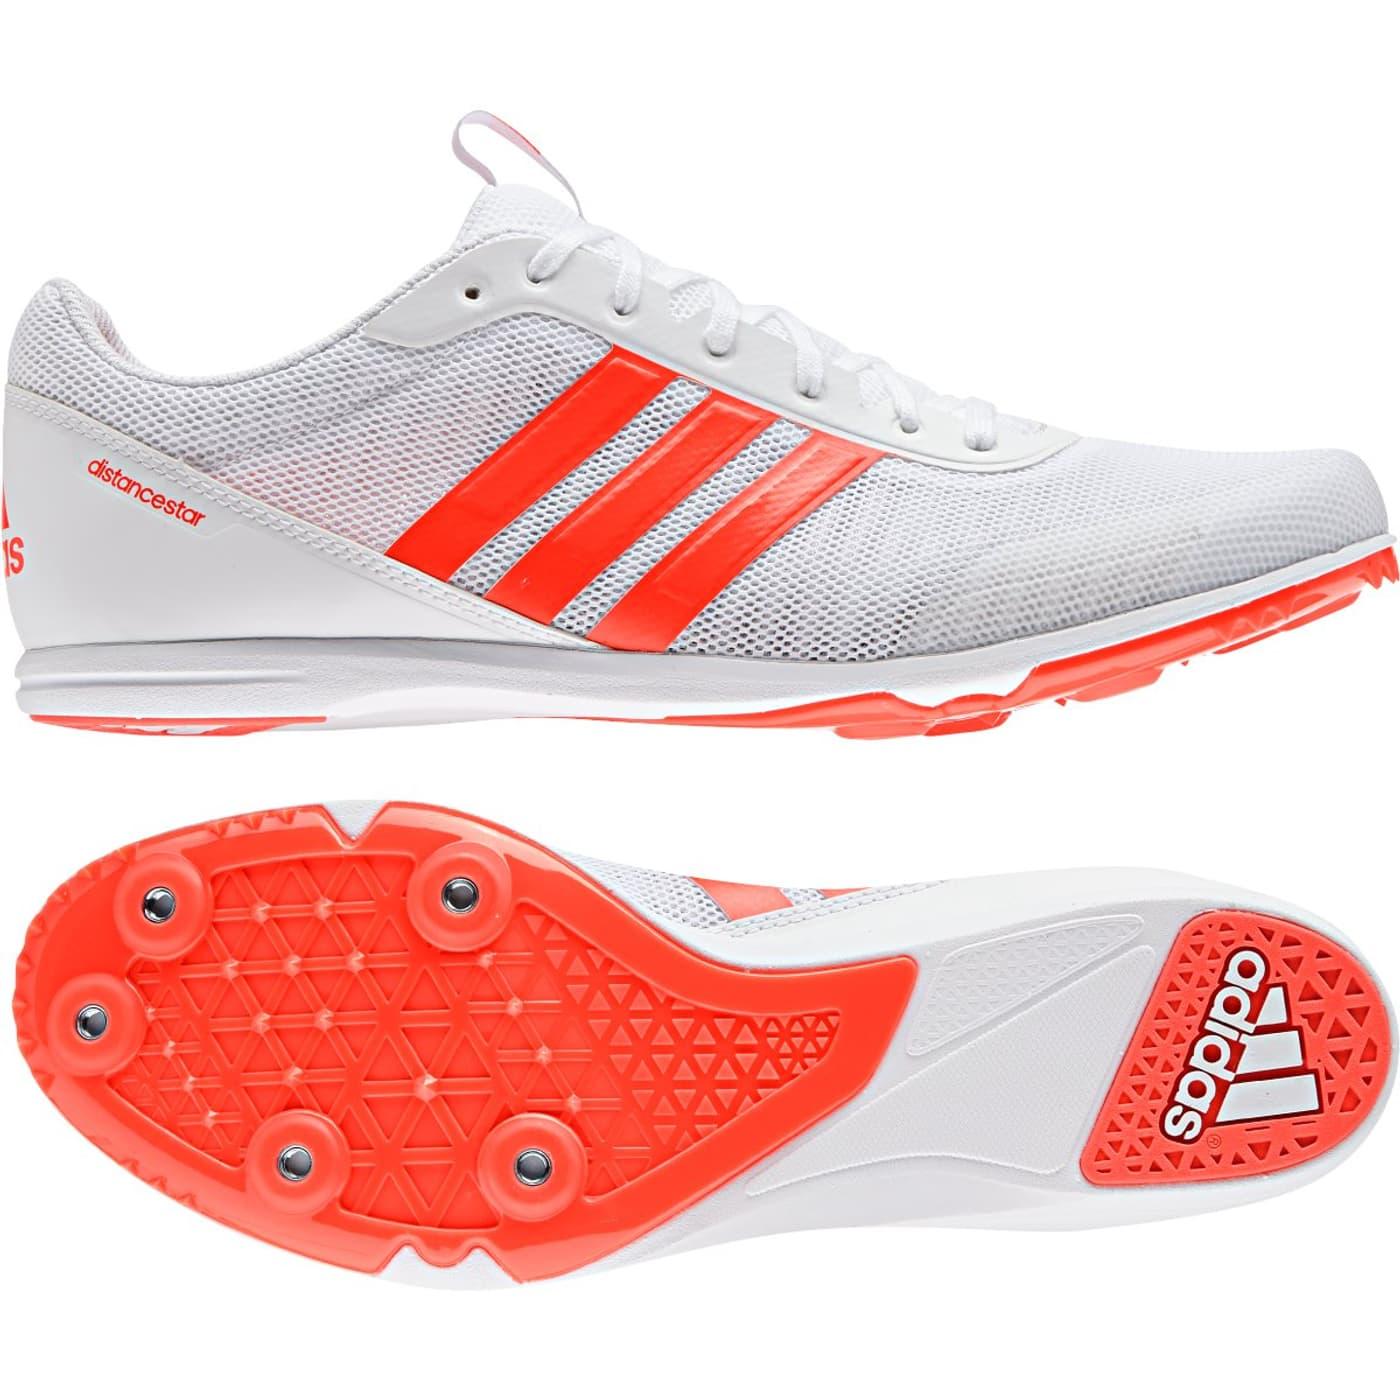 ... Adidas Distancestar Scarpa da uomo running ... 82b864ac27d